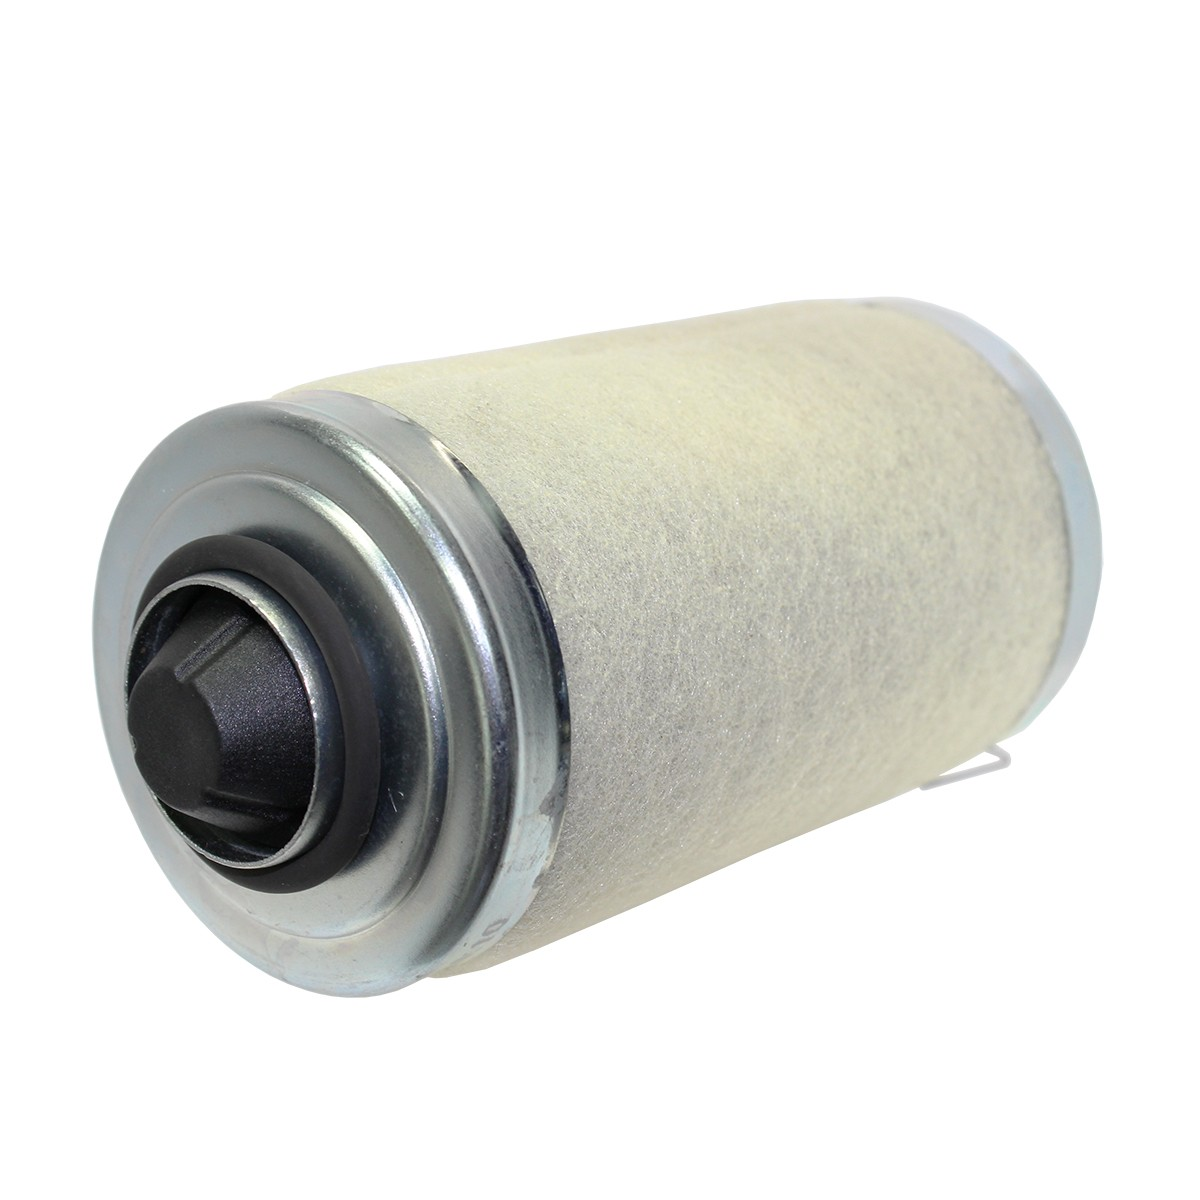 Exhaust Filter For Romanoff Vacuum Pumps - 12-21 CFM Pumps